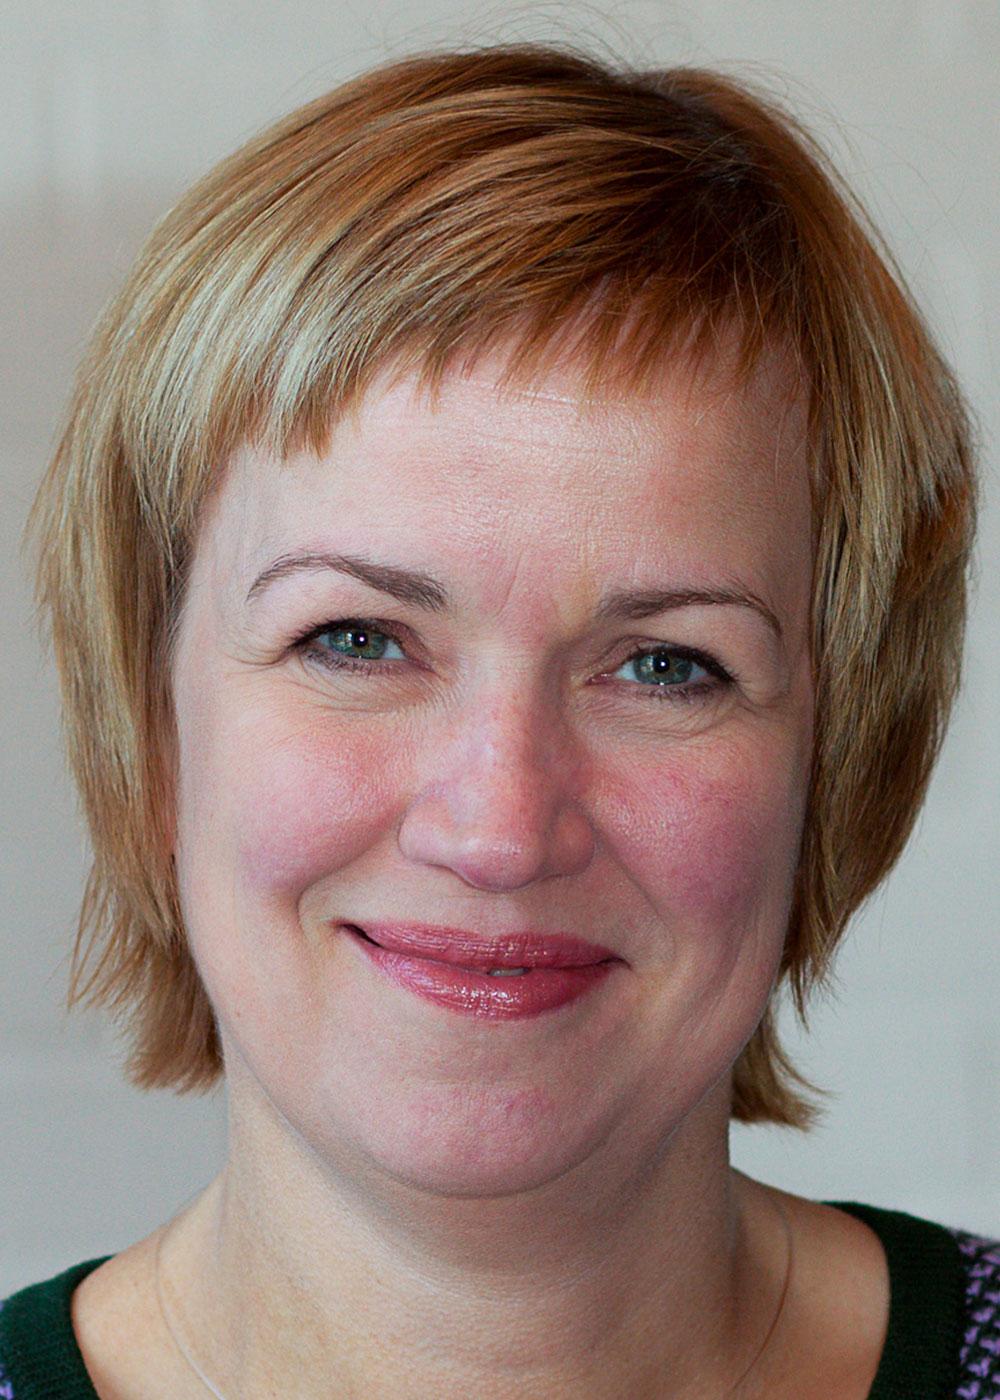 Martina Bley Personensuche Kontakt Bilder Profile